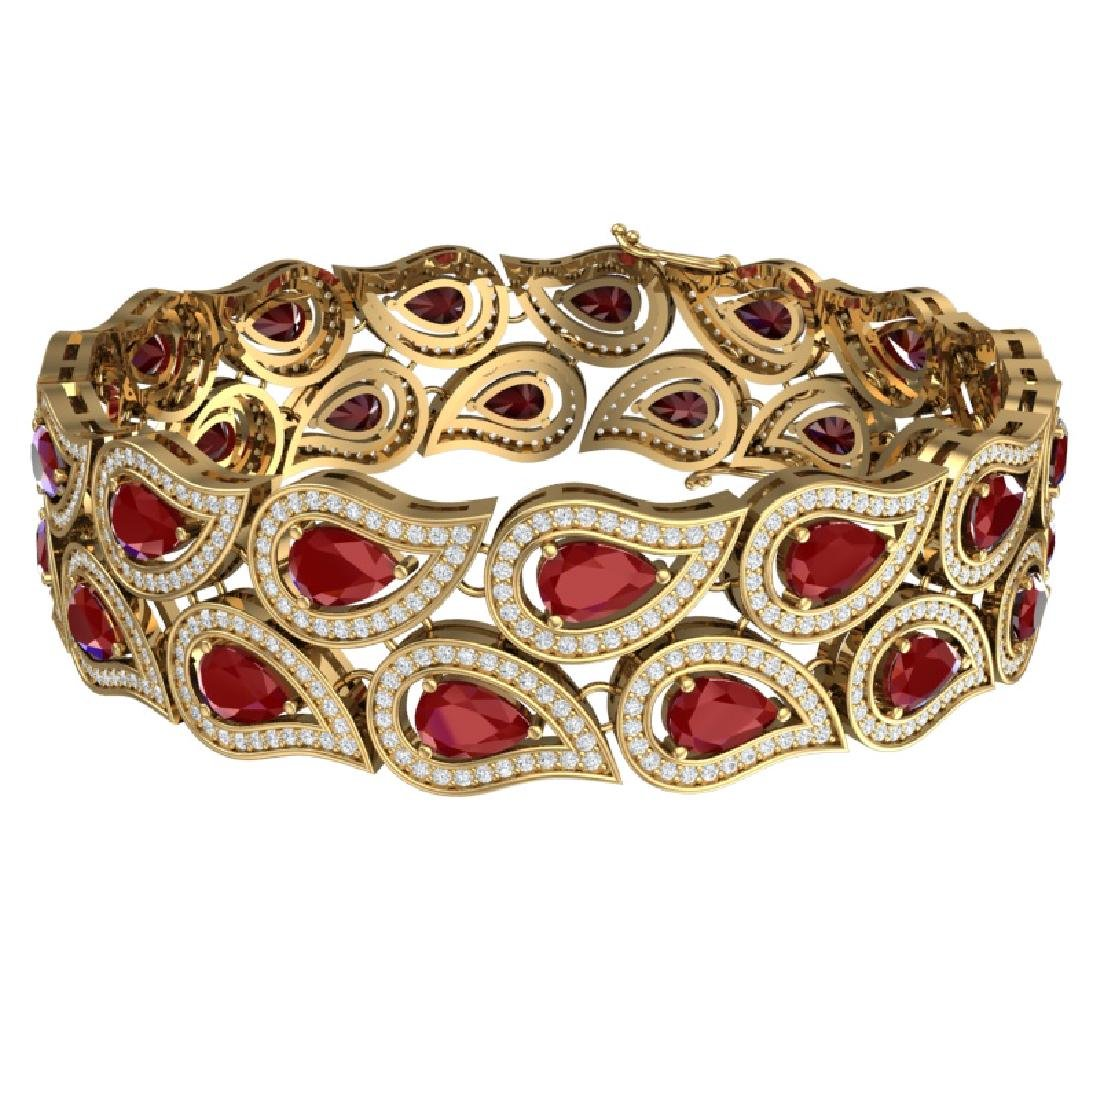 20.1 CTW Royalty Designer Ruby & VS Diamond Bracelet - 3